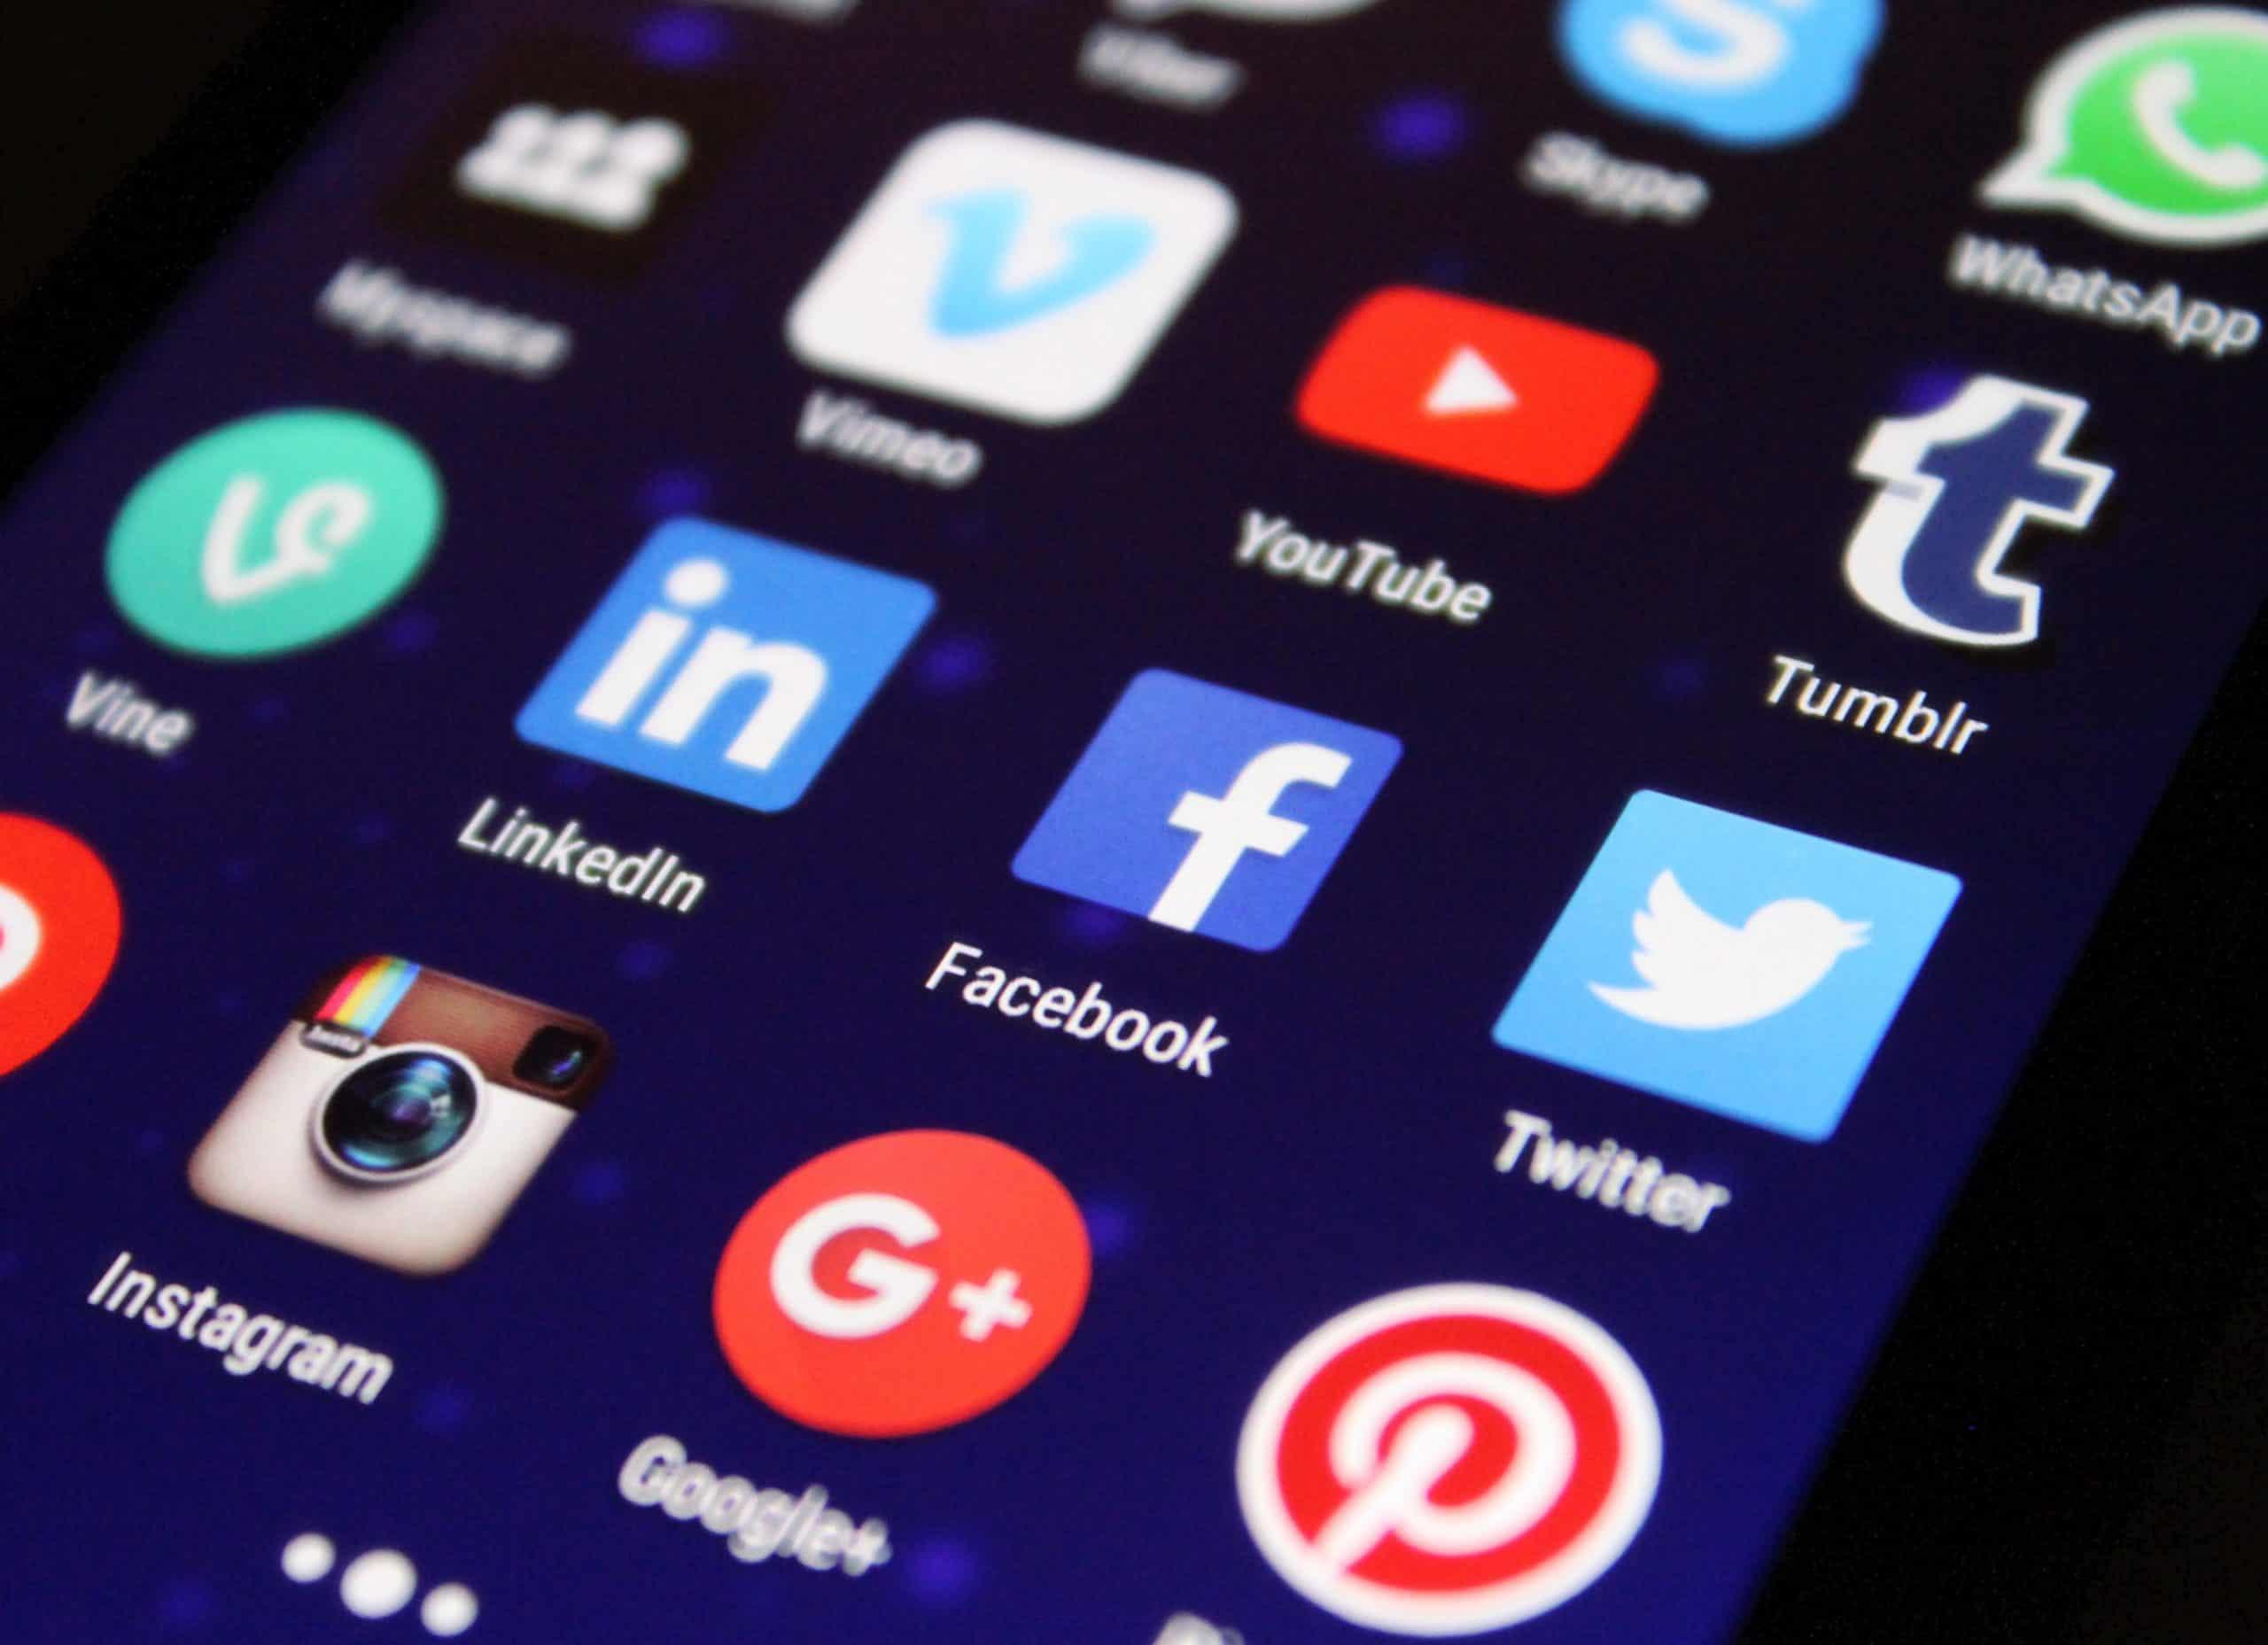 why do companies use social media?